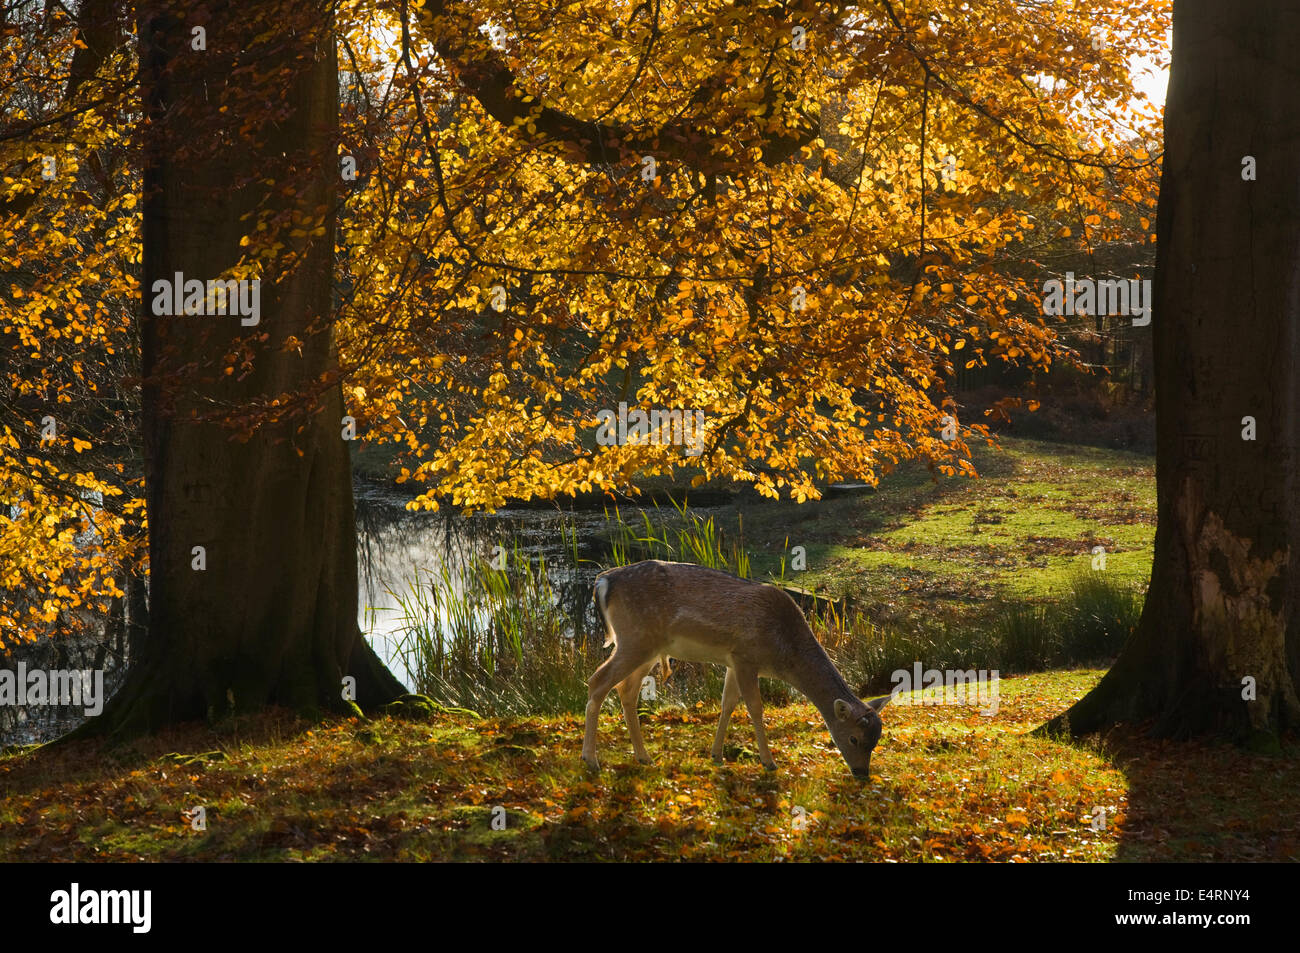 UK, Cheshire, Dunham Massey Park, autumn foliage and deer in warm sunlight - Stock Image